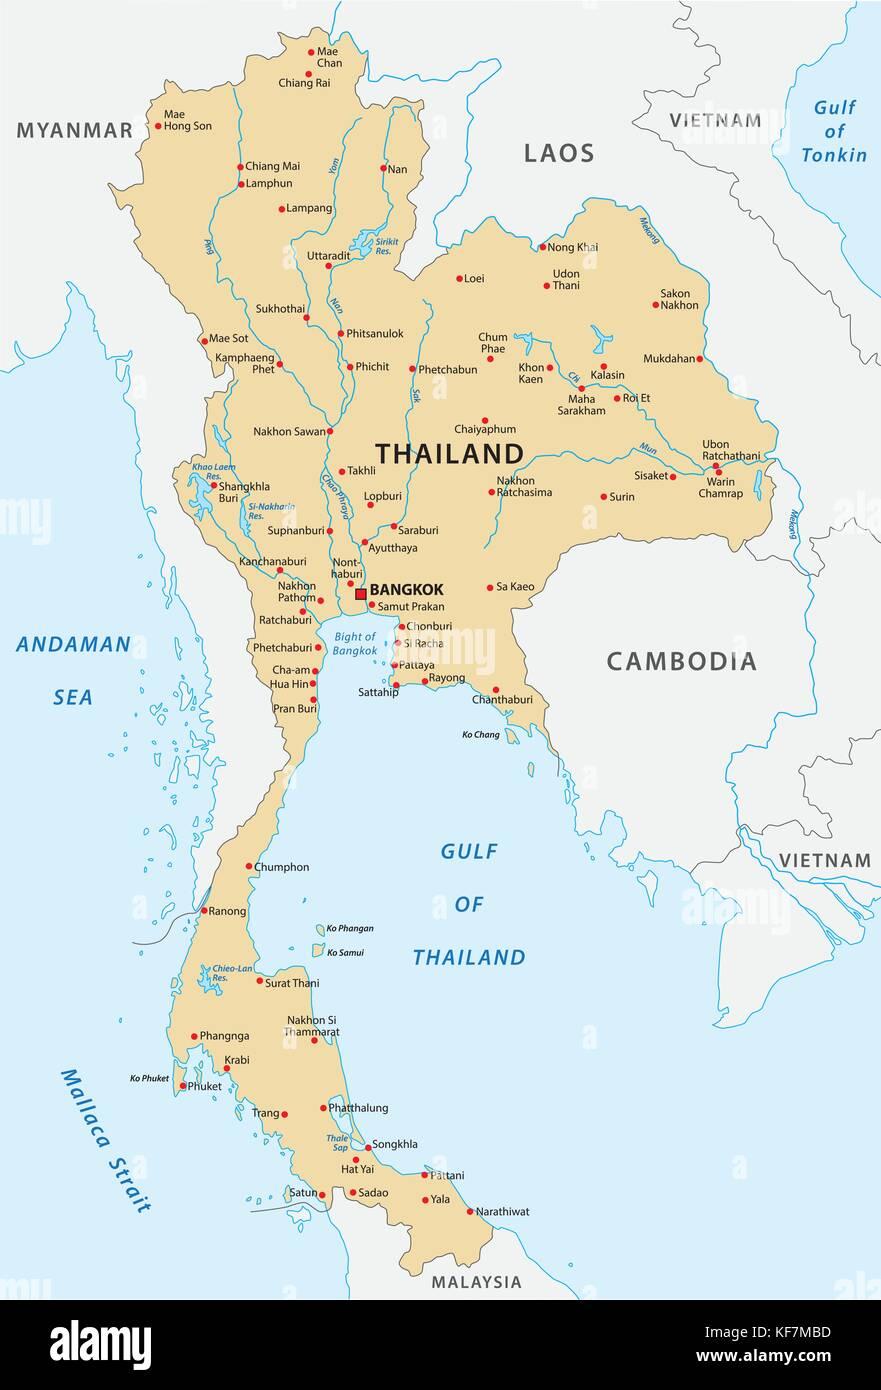 thailand vector map Stock Vector Art & Illustration, Vector Image ...